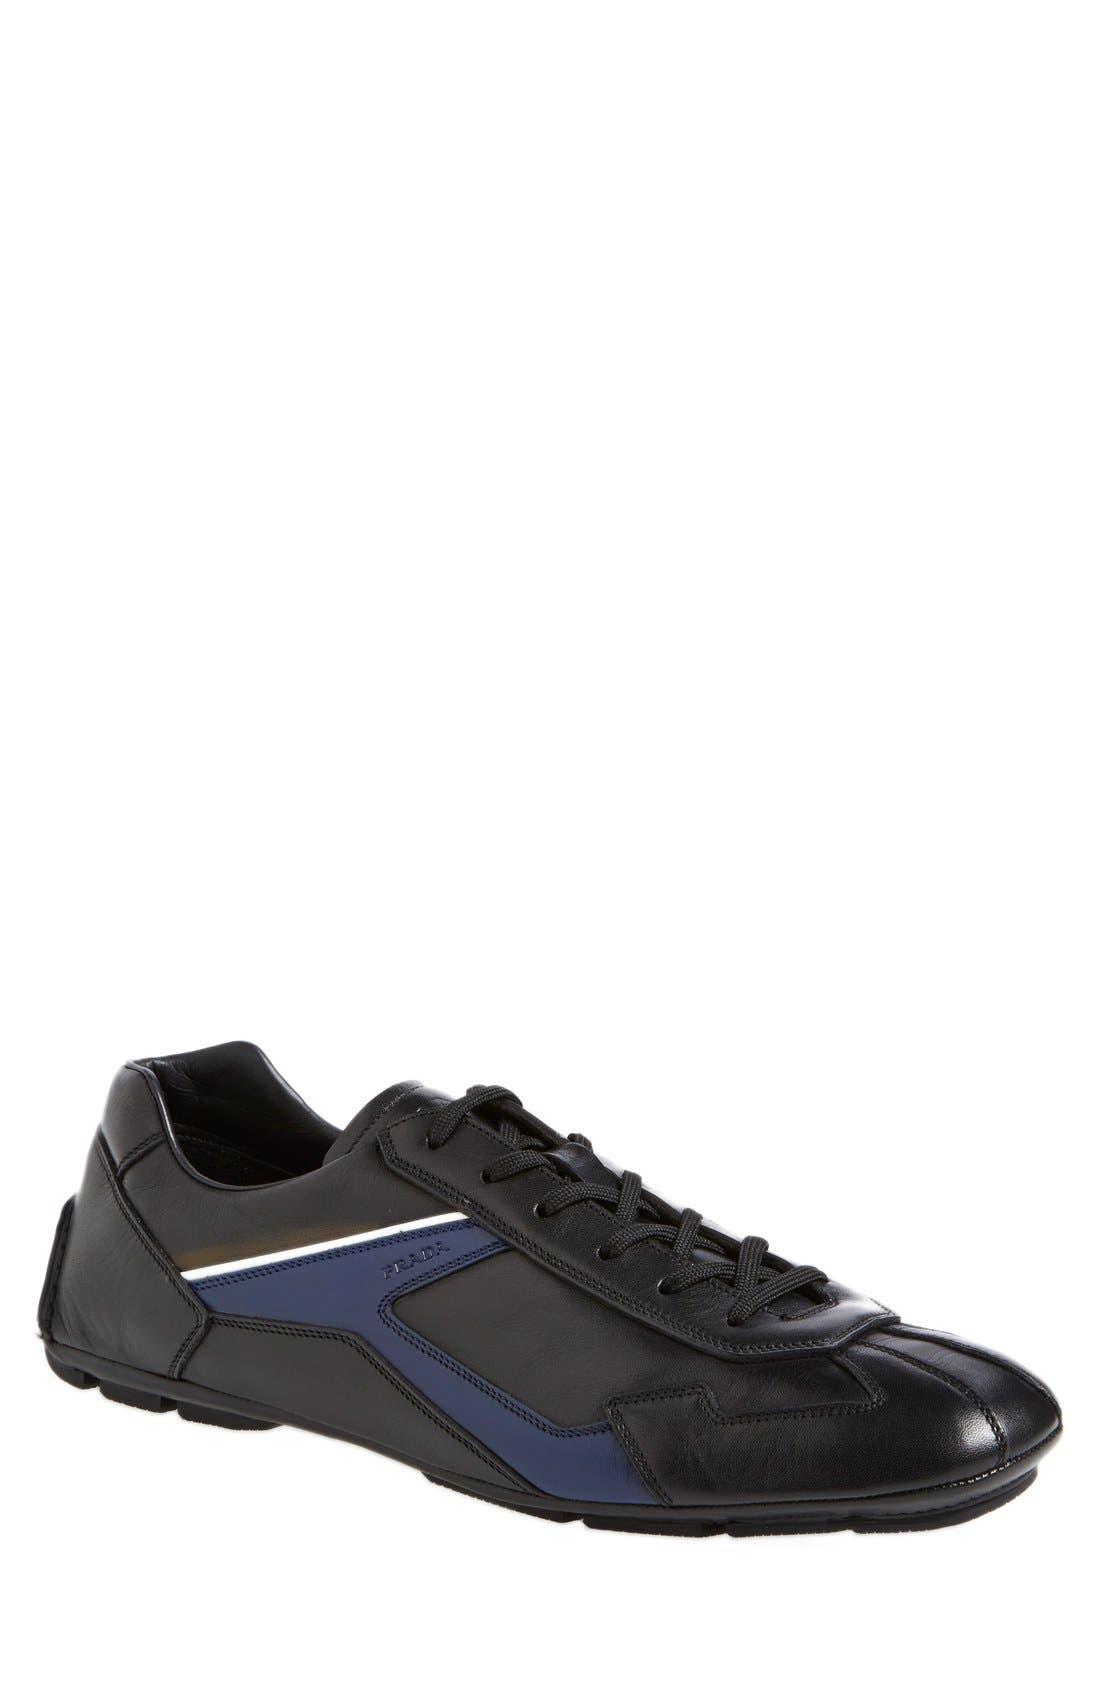 'Monte Carlo' Sneaker, Main, color, 001